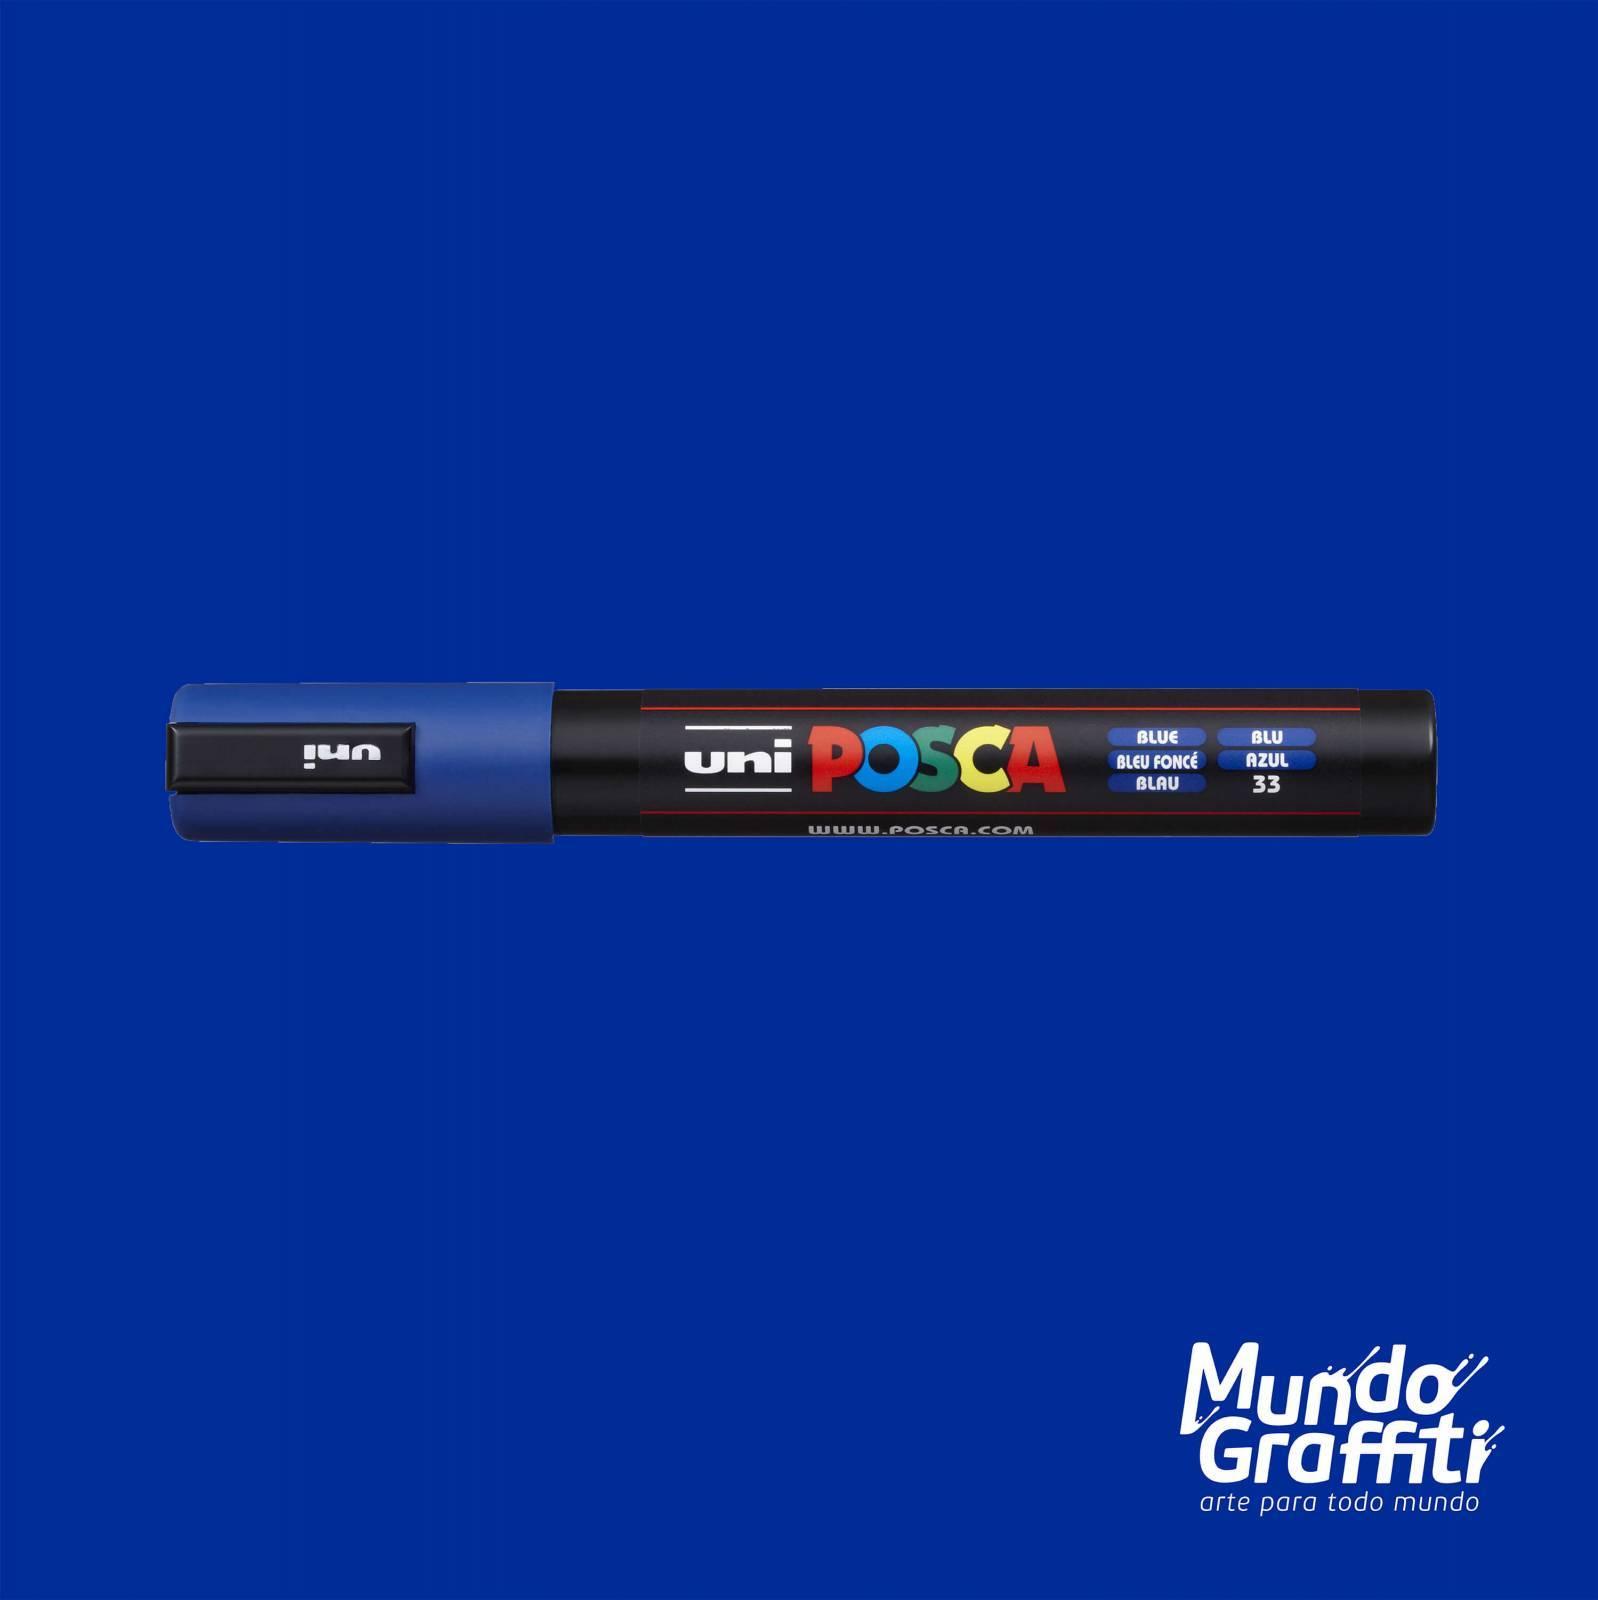 Caneta Posca 5M Azul - Mundo Graffiti